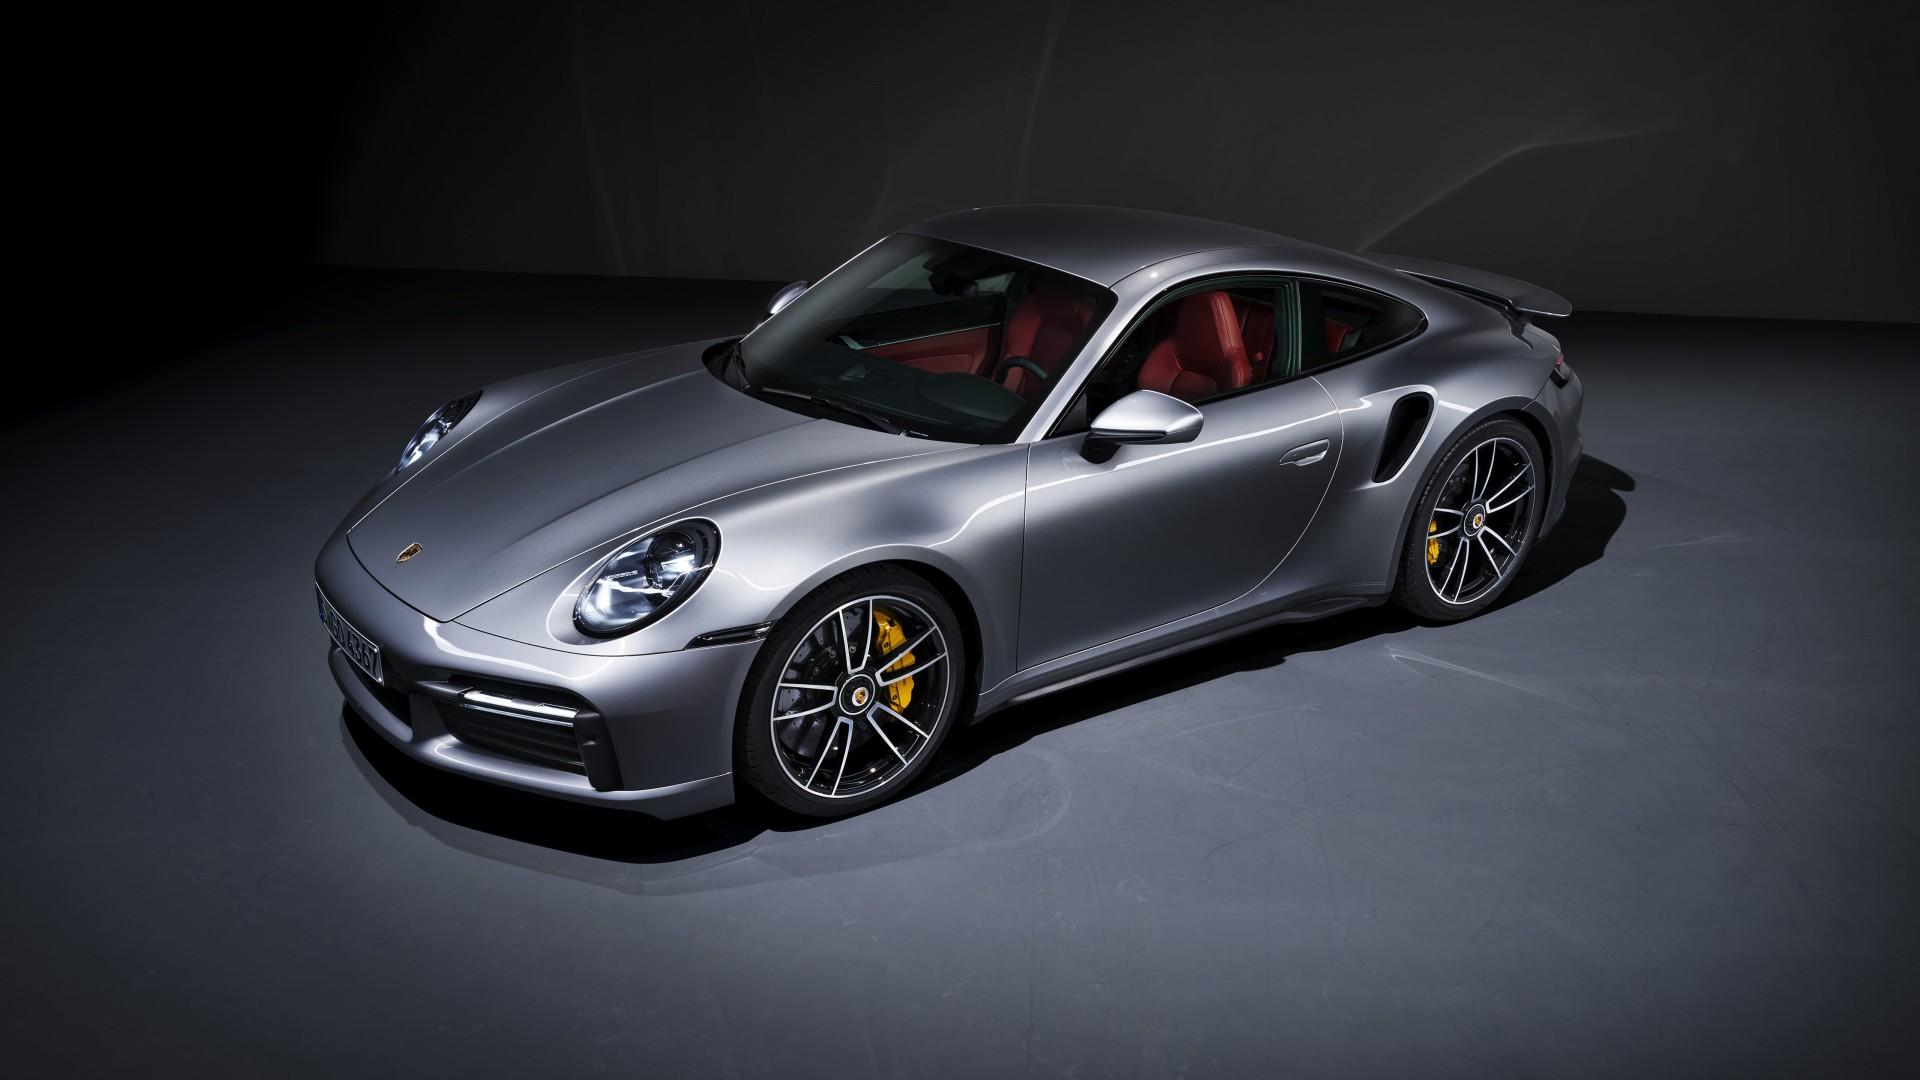 Porsche 911 Turbo S 2020 5k Wallpaper Hd Car Wallpapers